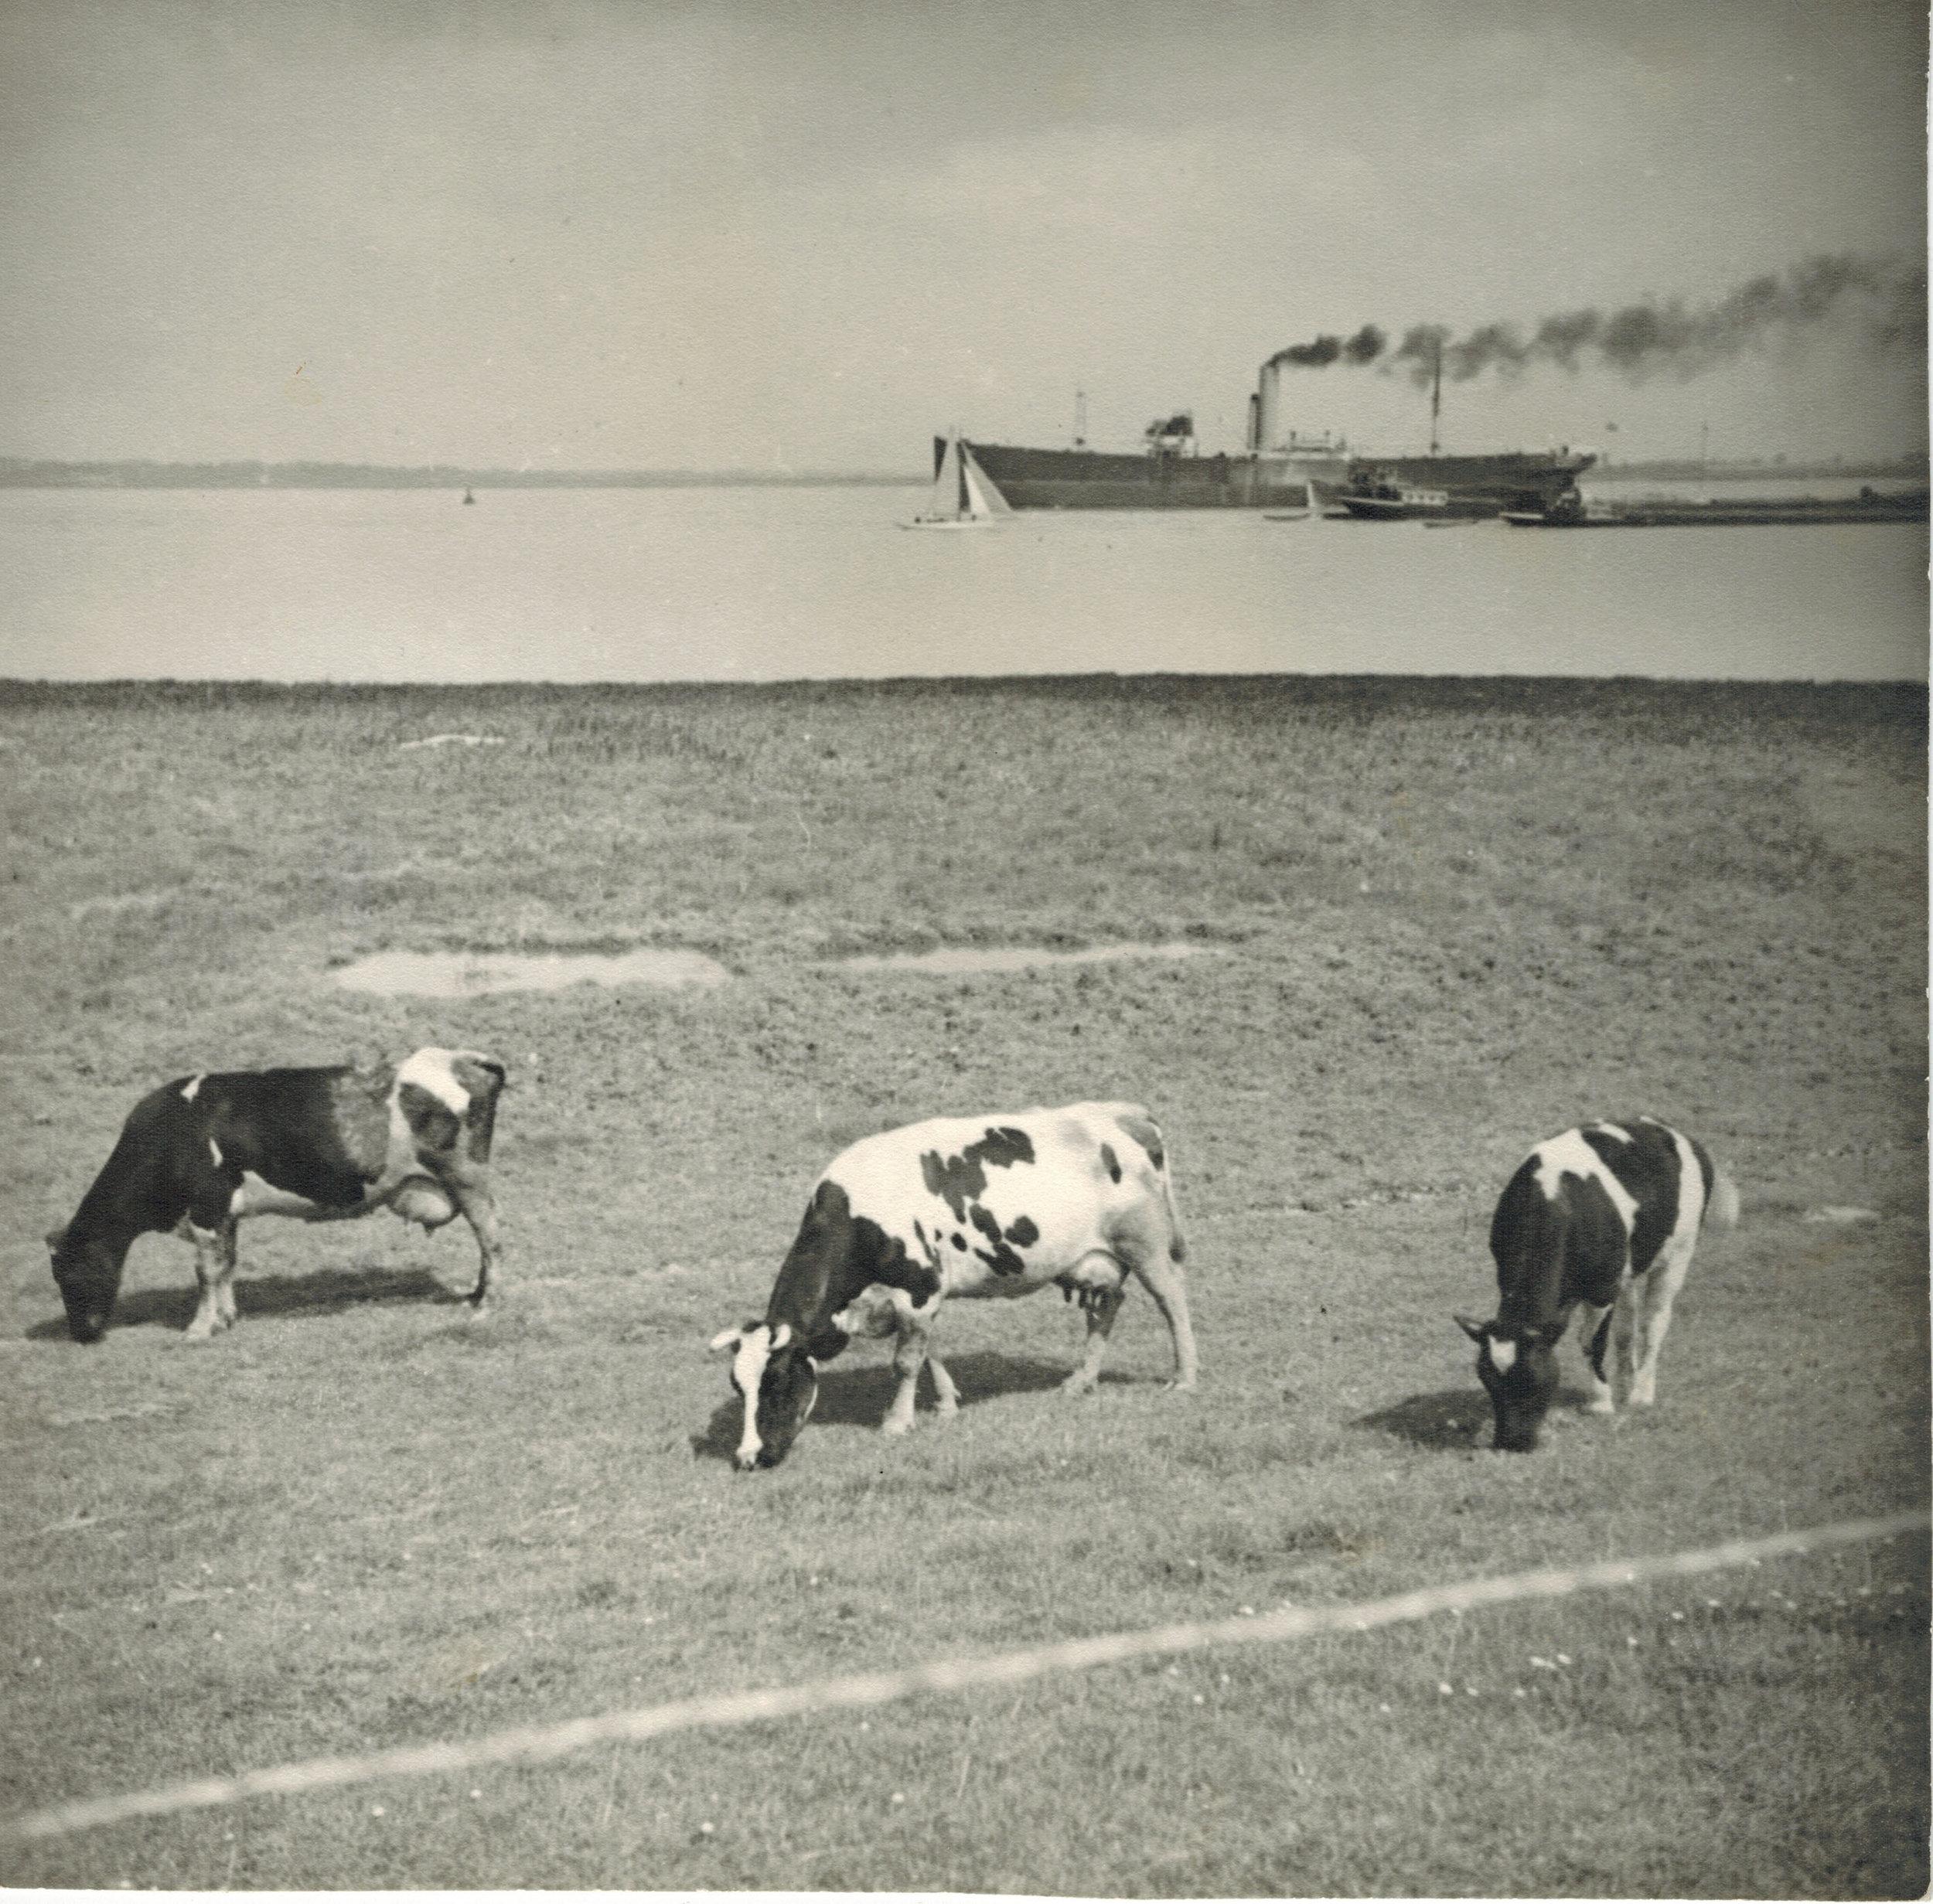 Albert Renger-Patzsch,  Cows grazing with steamship behind (Landscape in Northern Germany) , 1930, Gelatin silver print, stamped verso, 17.2 x 17.2 cm